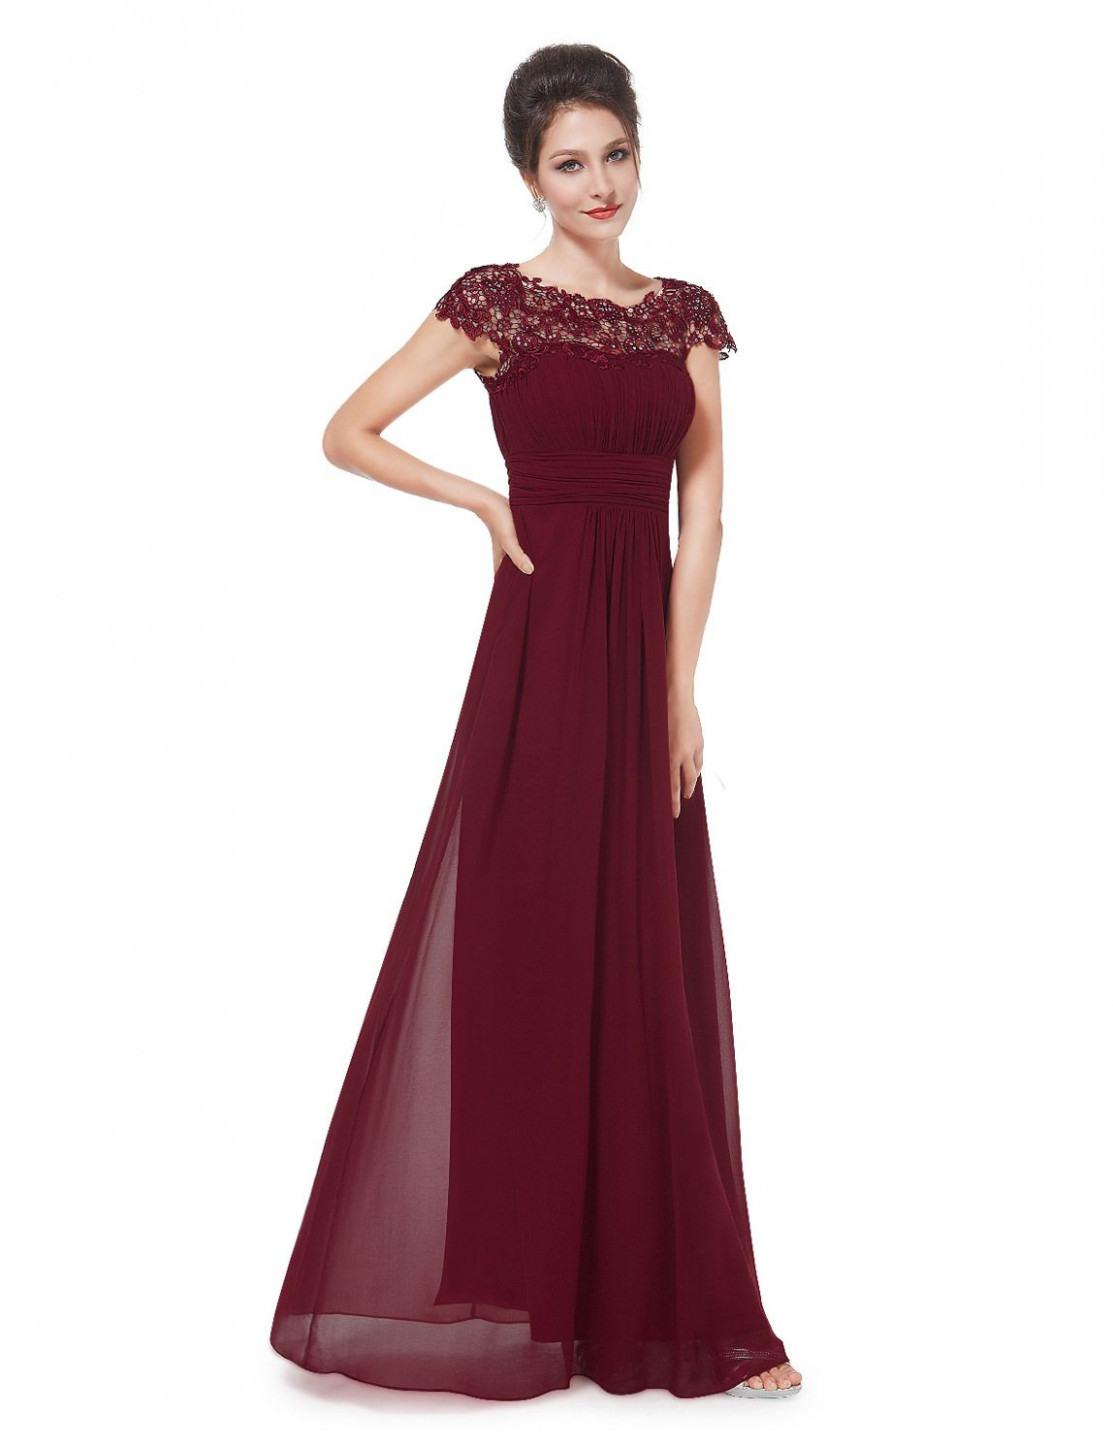 Kleid Lang Bordeaux  Abendkleider